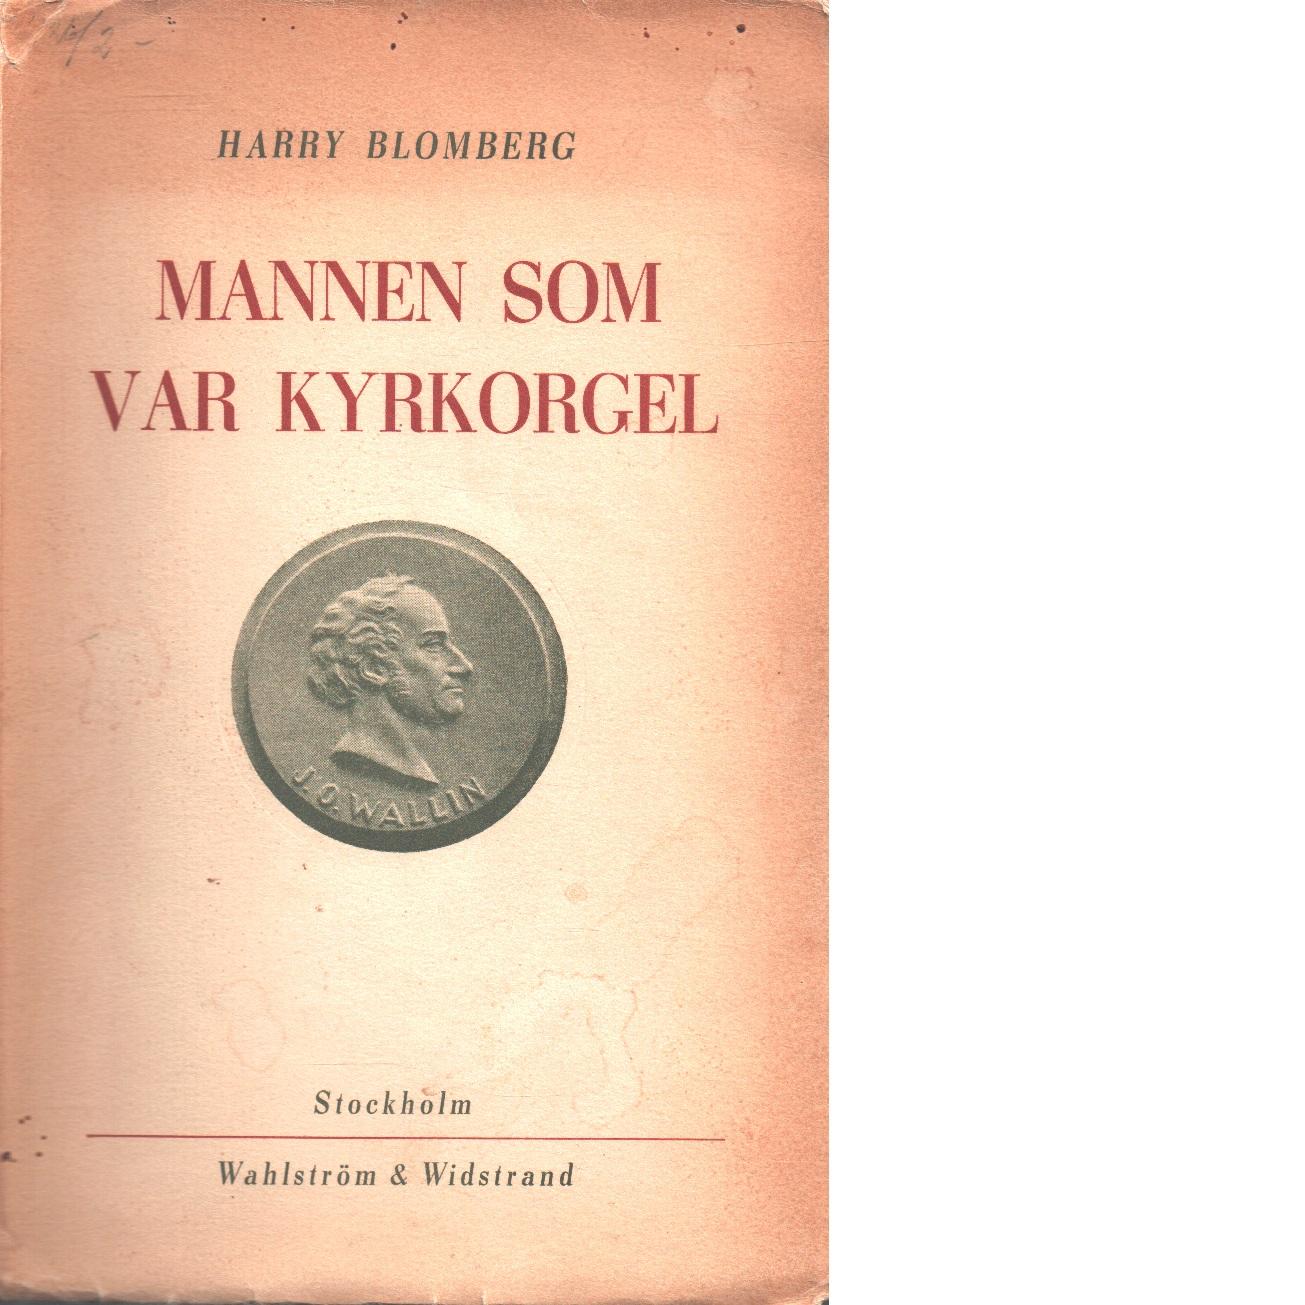 Mannen som var kyrkorgel - Blomberg, Harry